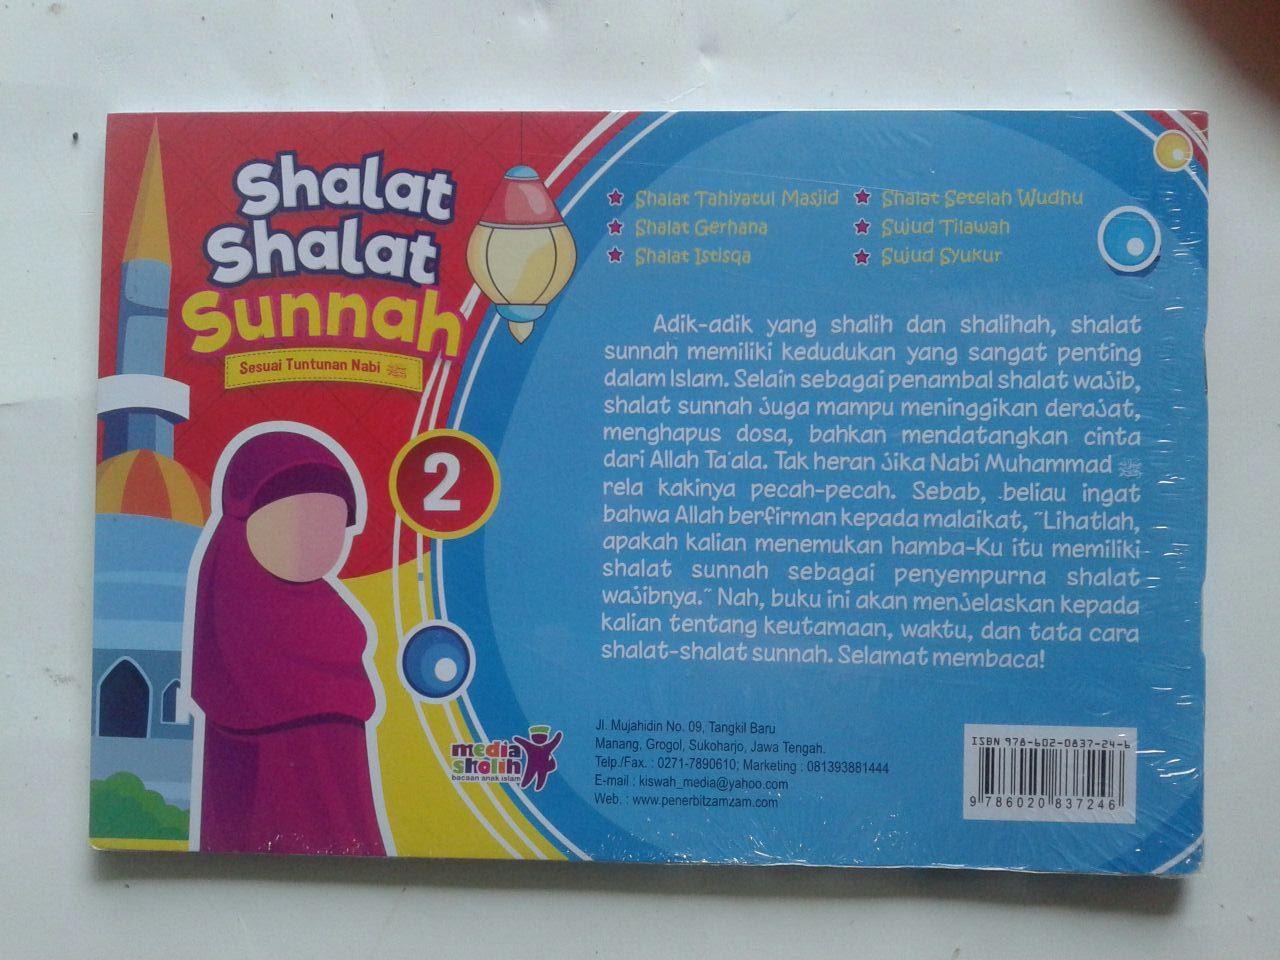 Buku Anak Shalat Shalat Sunnah Sesuai Tuntunan Nabi 2 cover